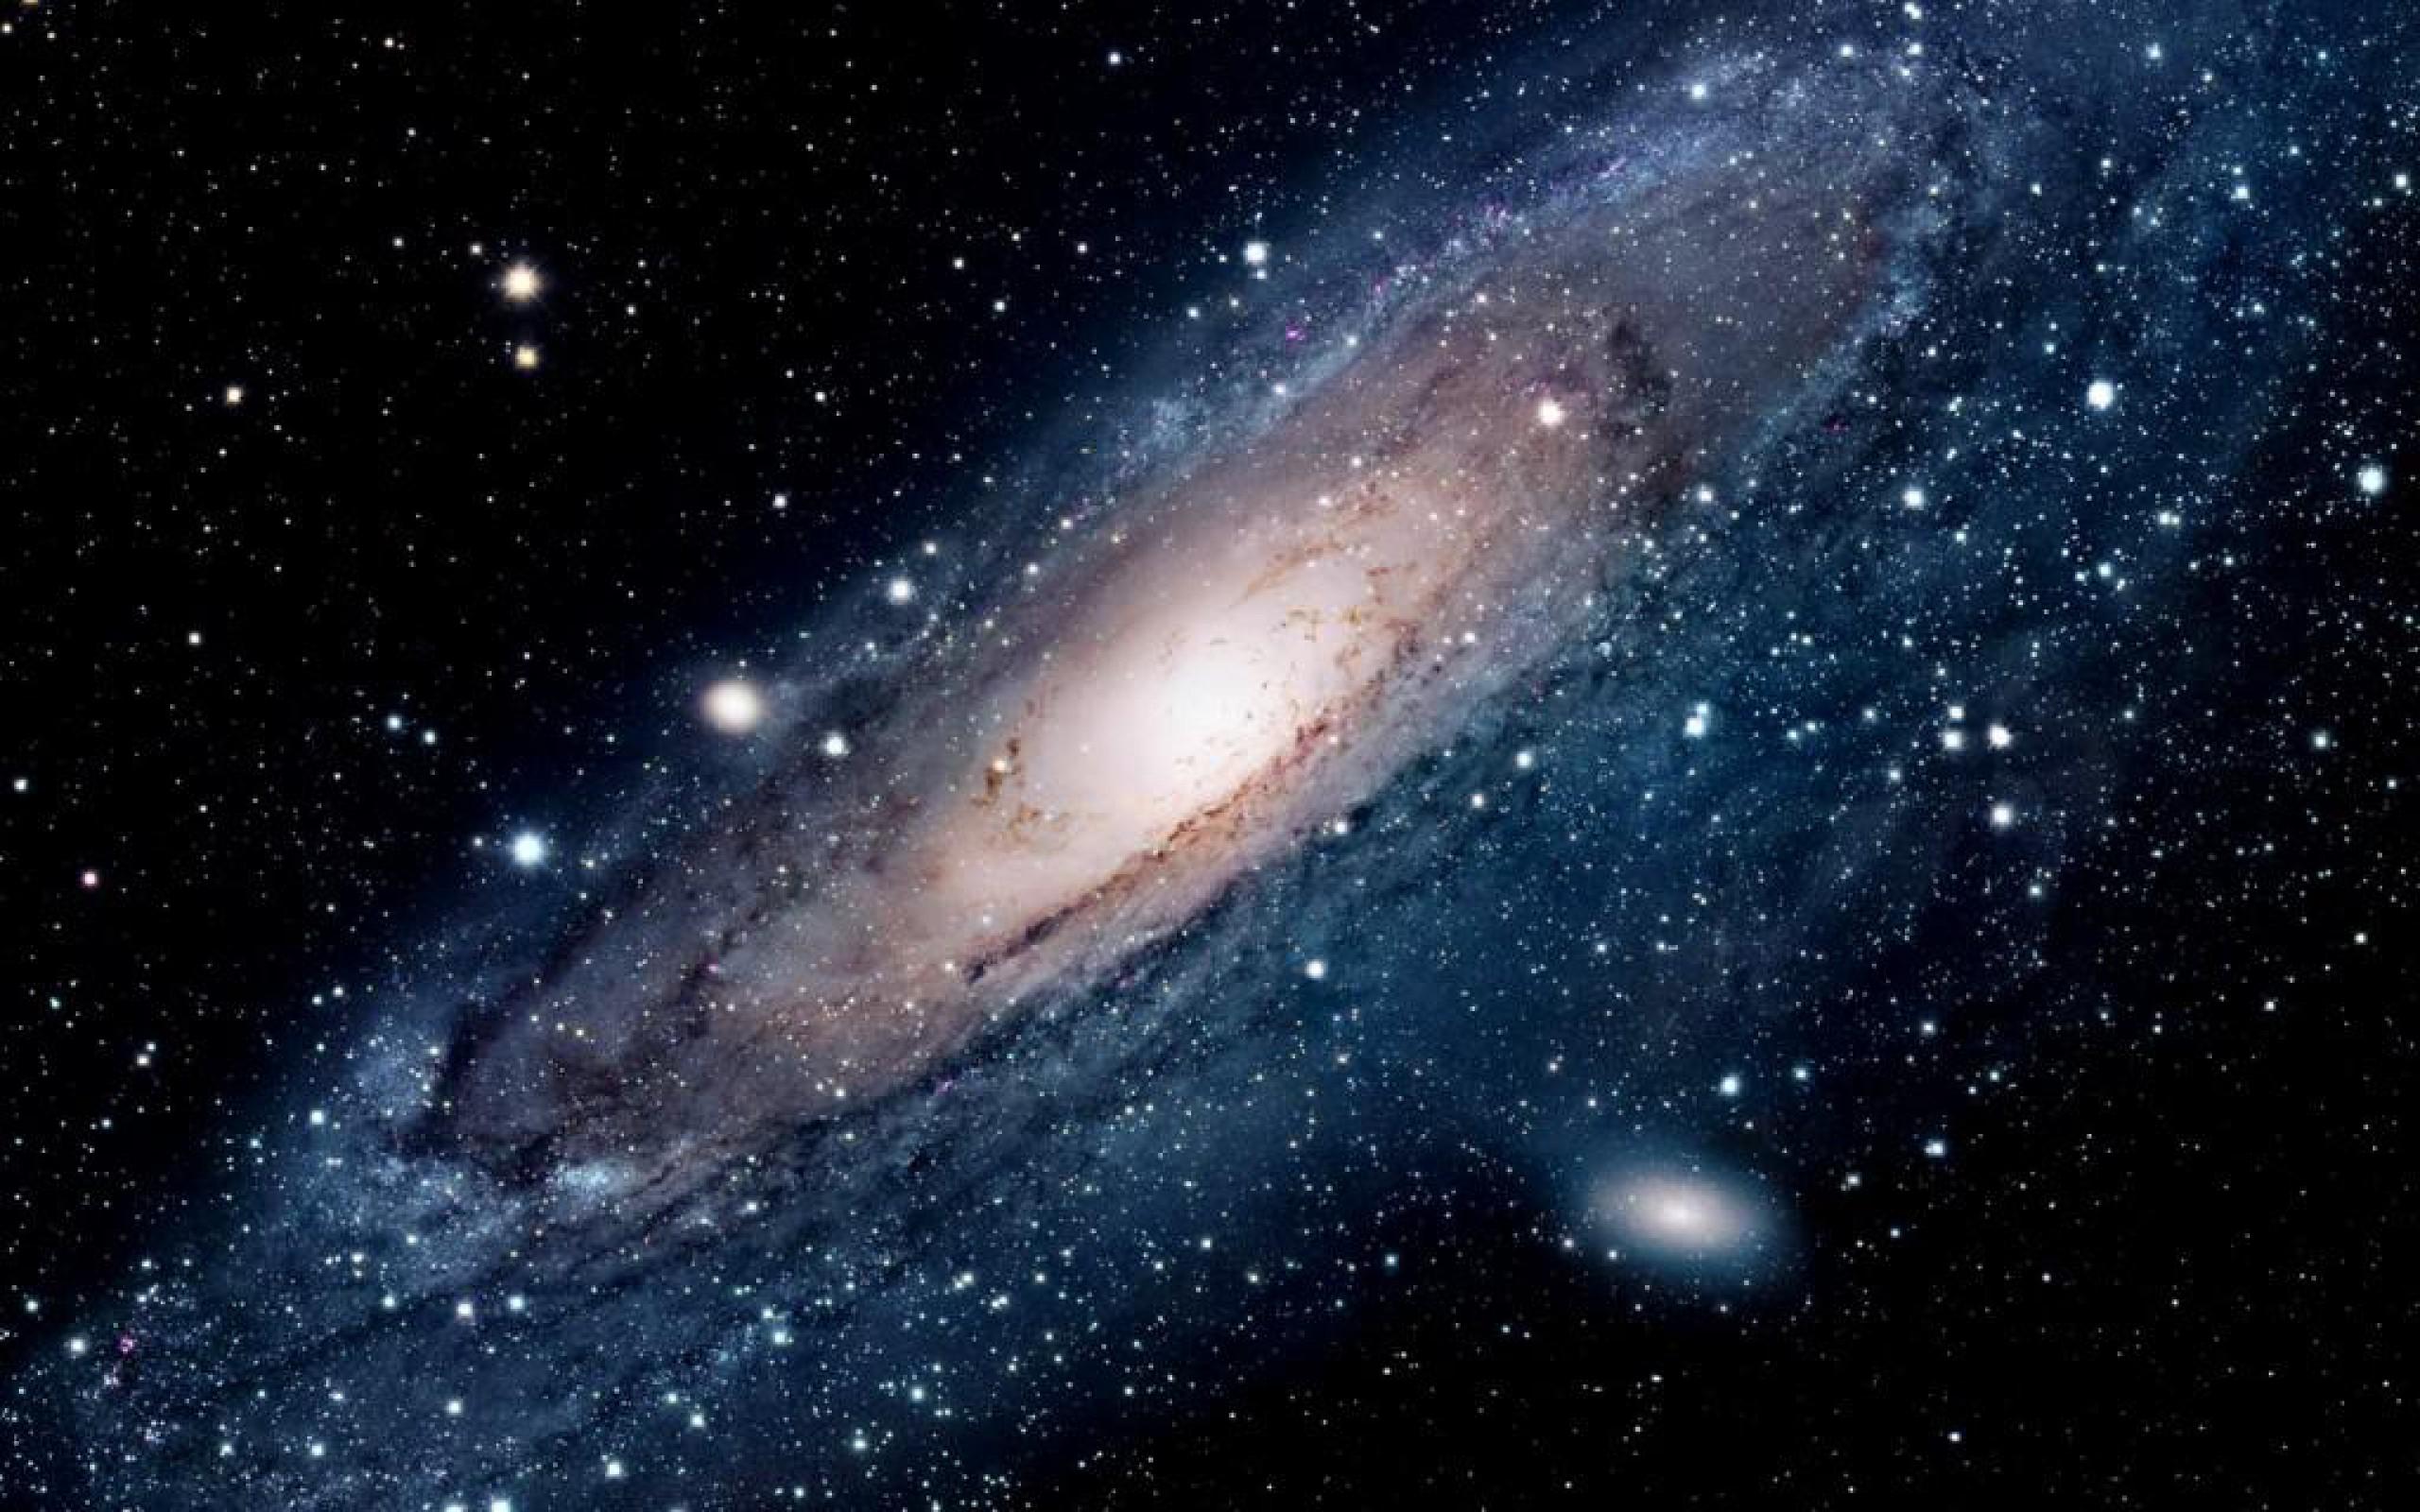 Hd wallpaper galaxy - Andromeda Galaxy Exclusive Hd Wallpapers 2437